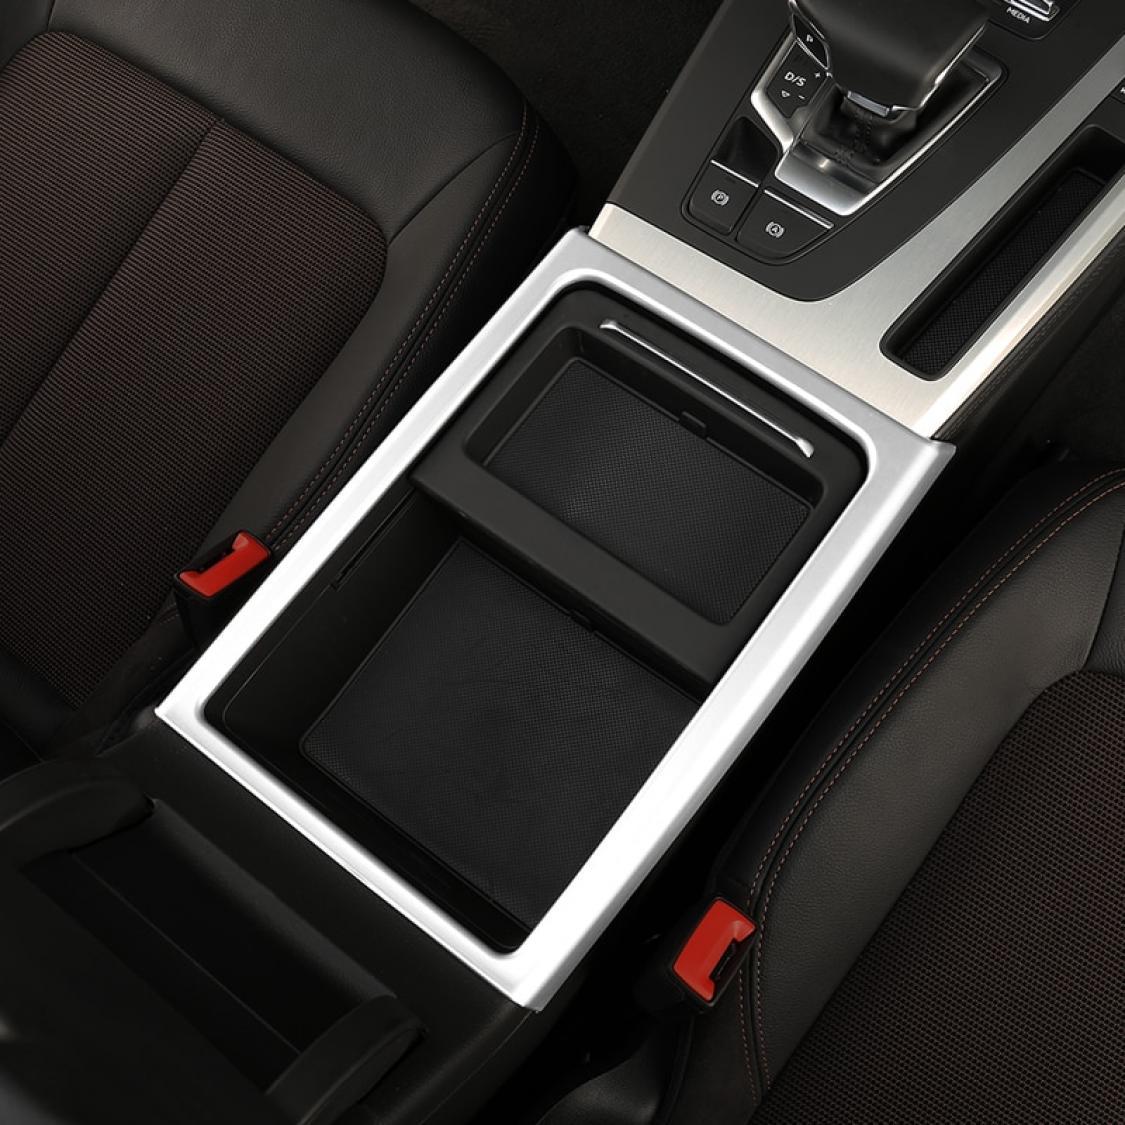 Radioblende Armaturenbrett Passend Für Audi A4 B8 Q5 SQ5 Sline Edelstahl Optik